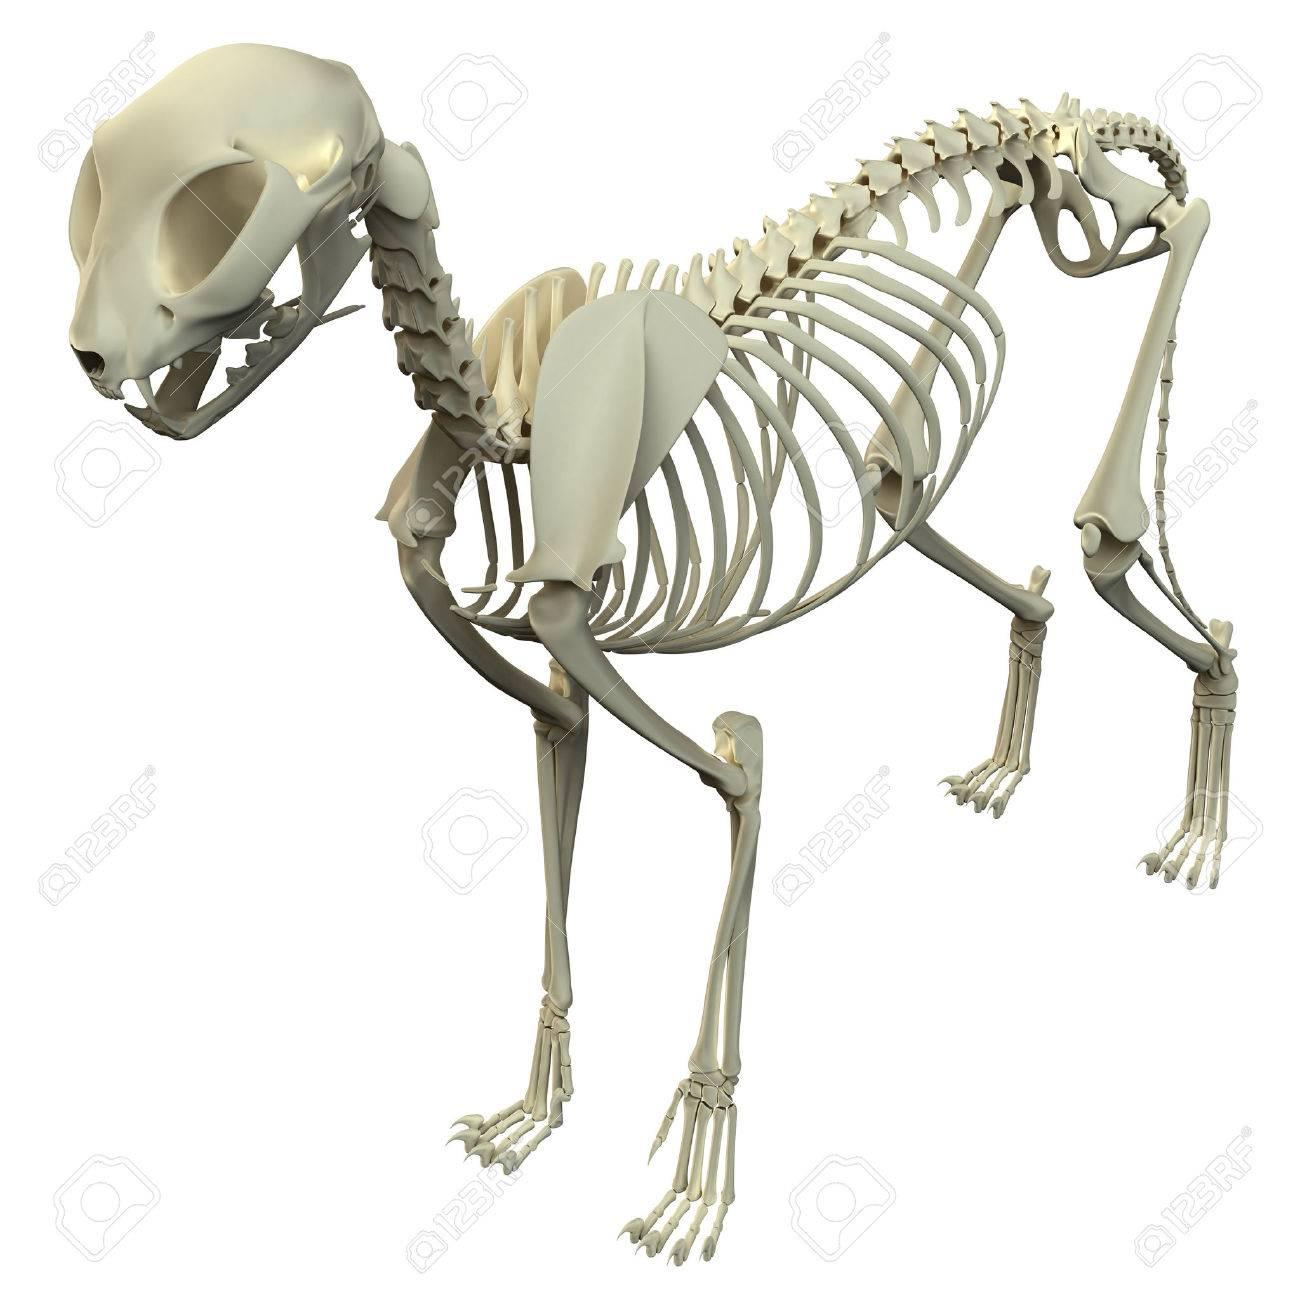 Cat Skeleton Anatomy - Anatomy Of A Cat Skeleton Stock Photo ...